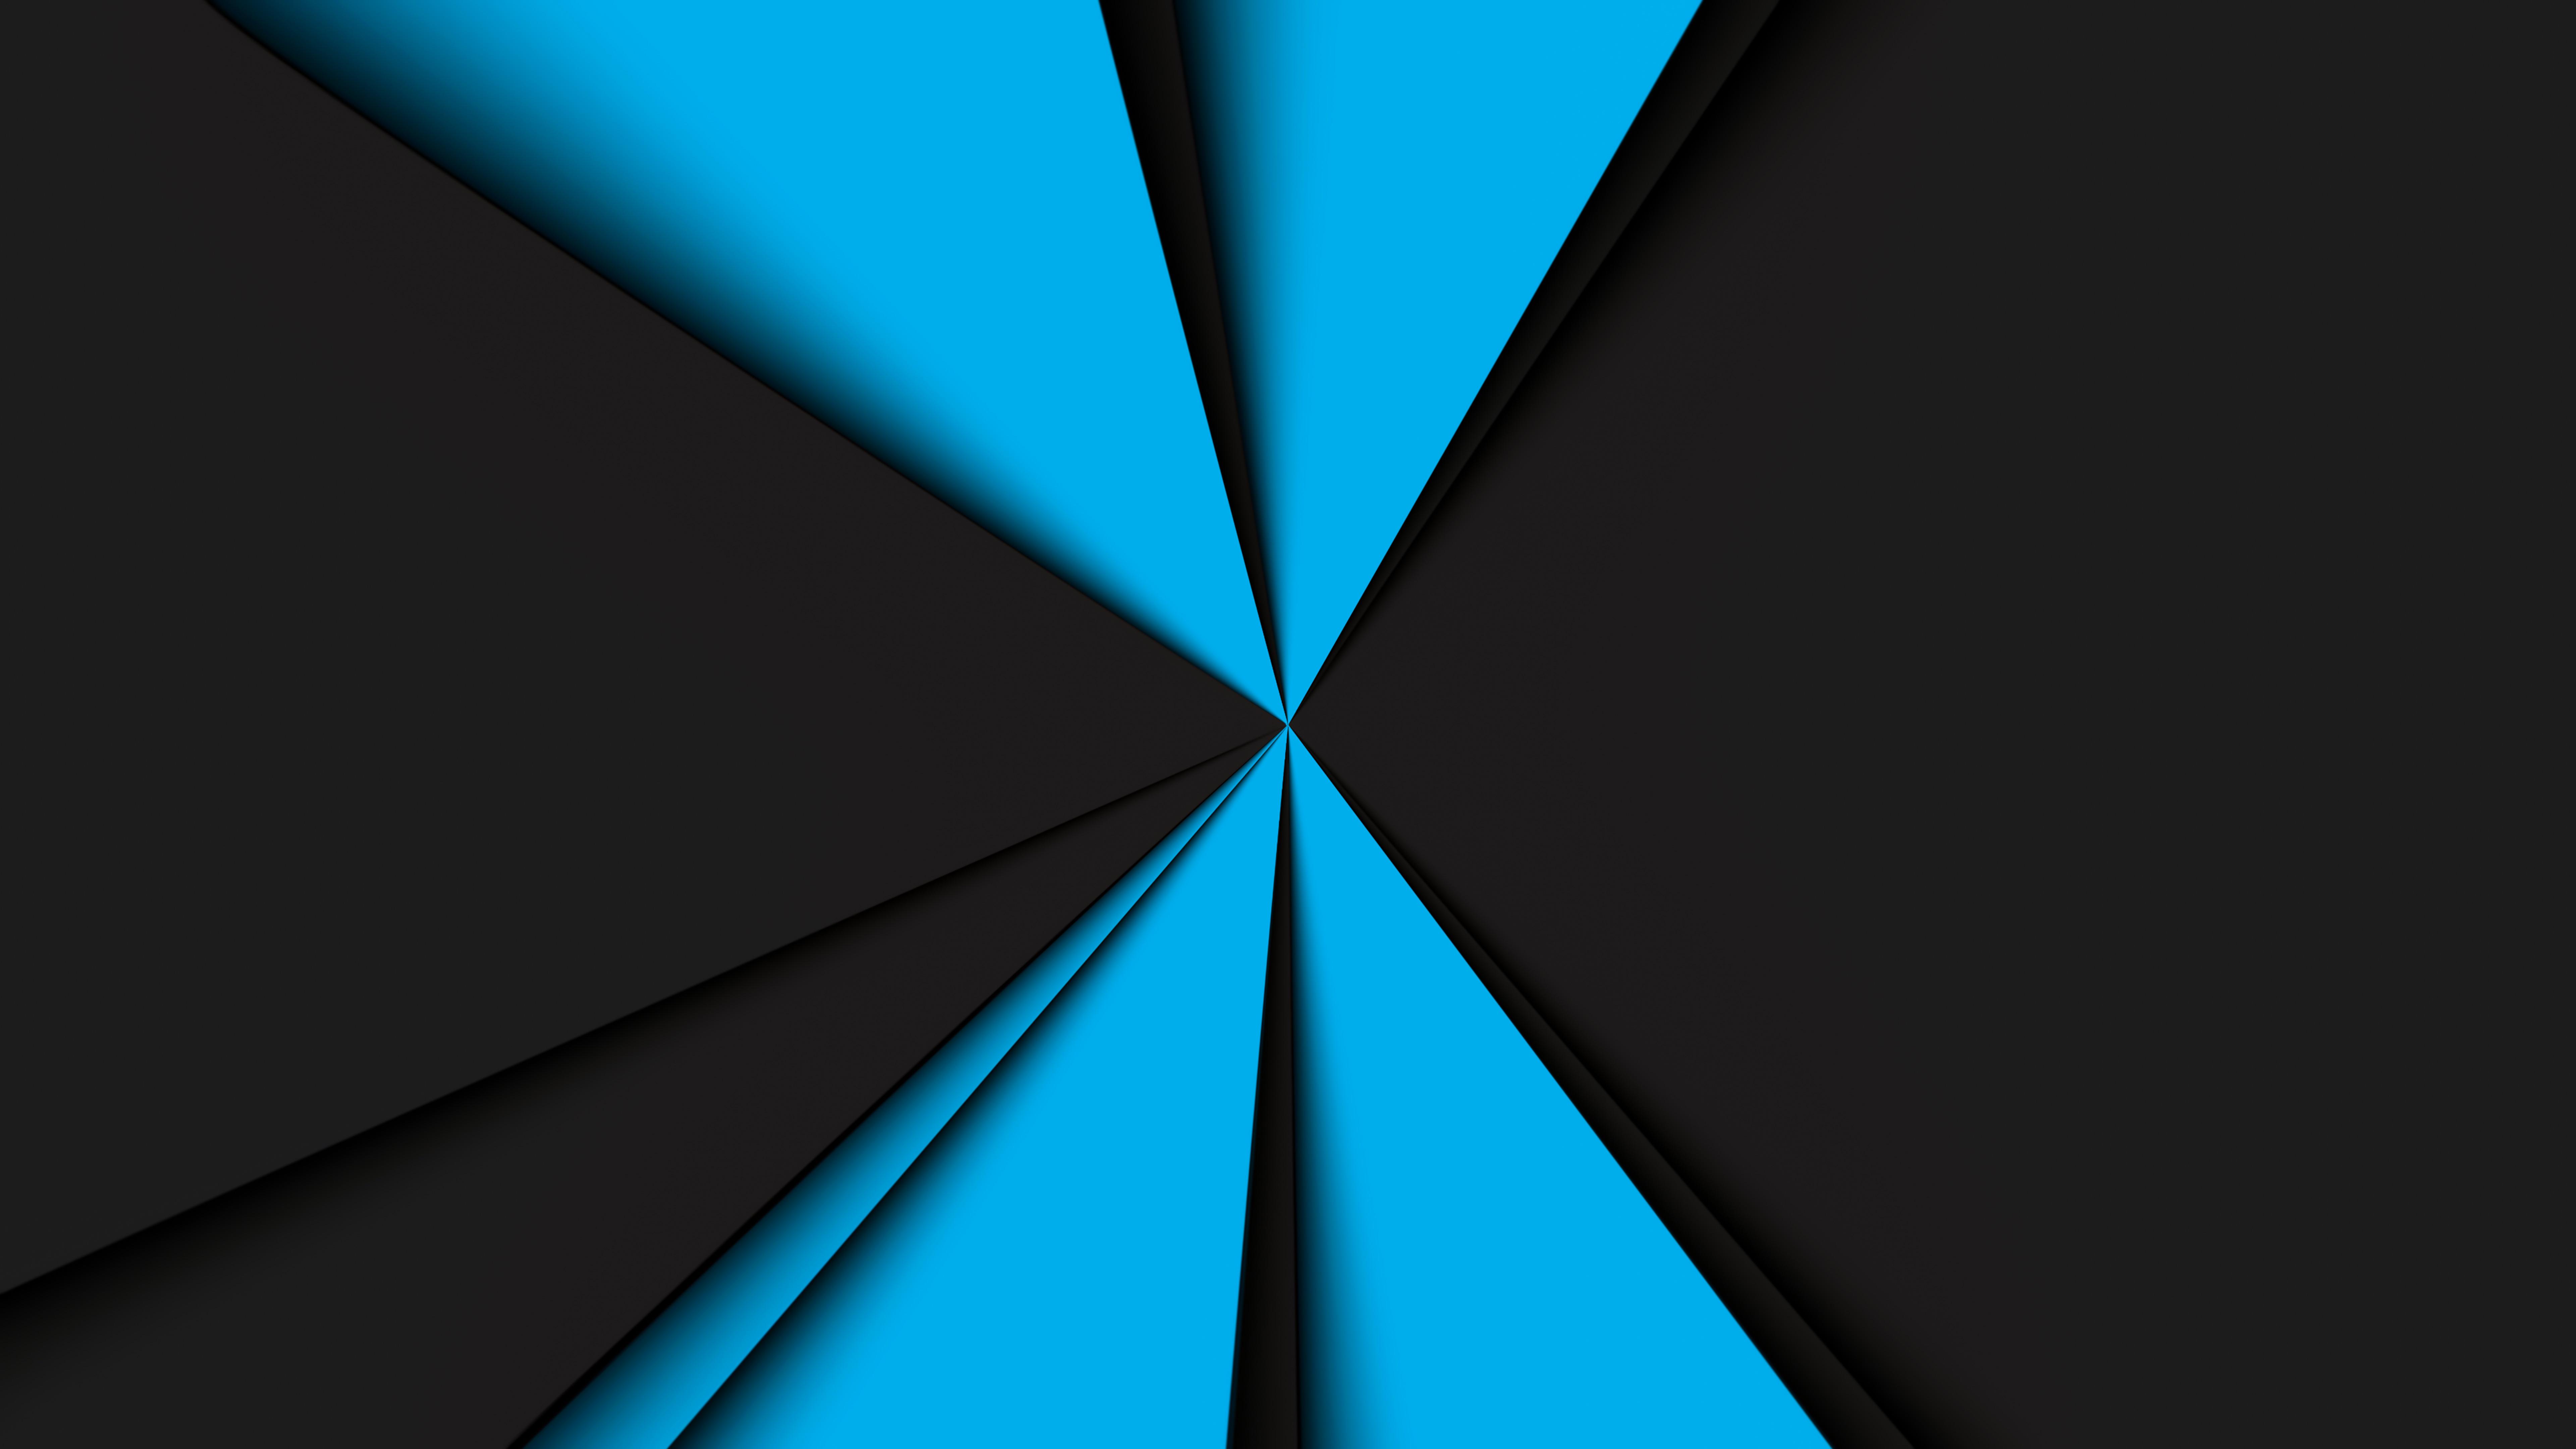 blue dark geometry 4k 1620165546 - Blue Dark Geometry 4k - Blue Dark Geometry 4k wallpapers